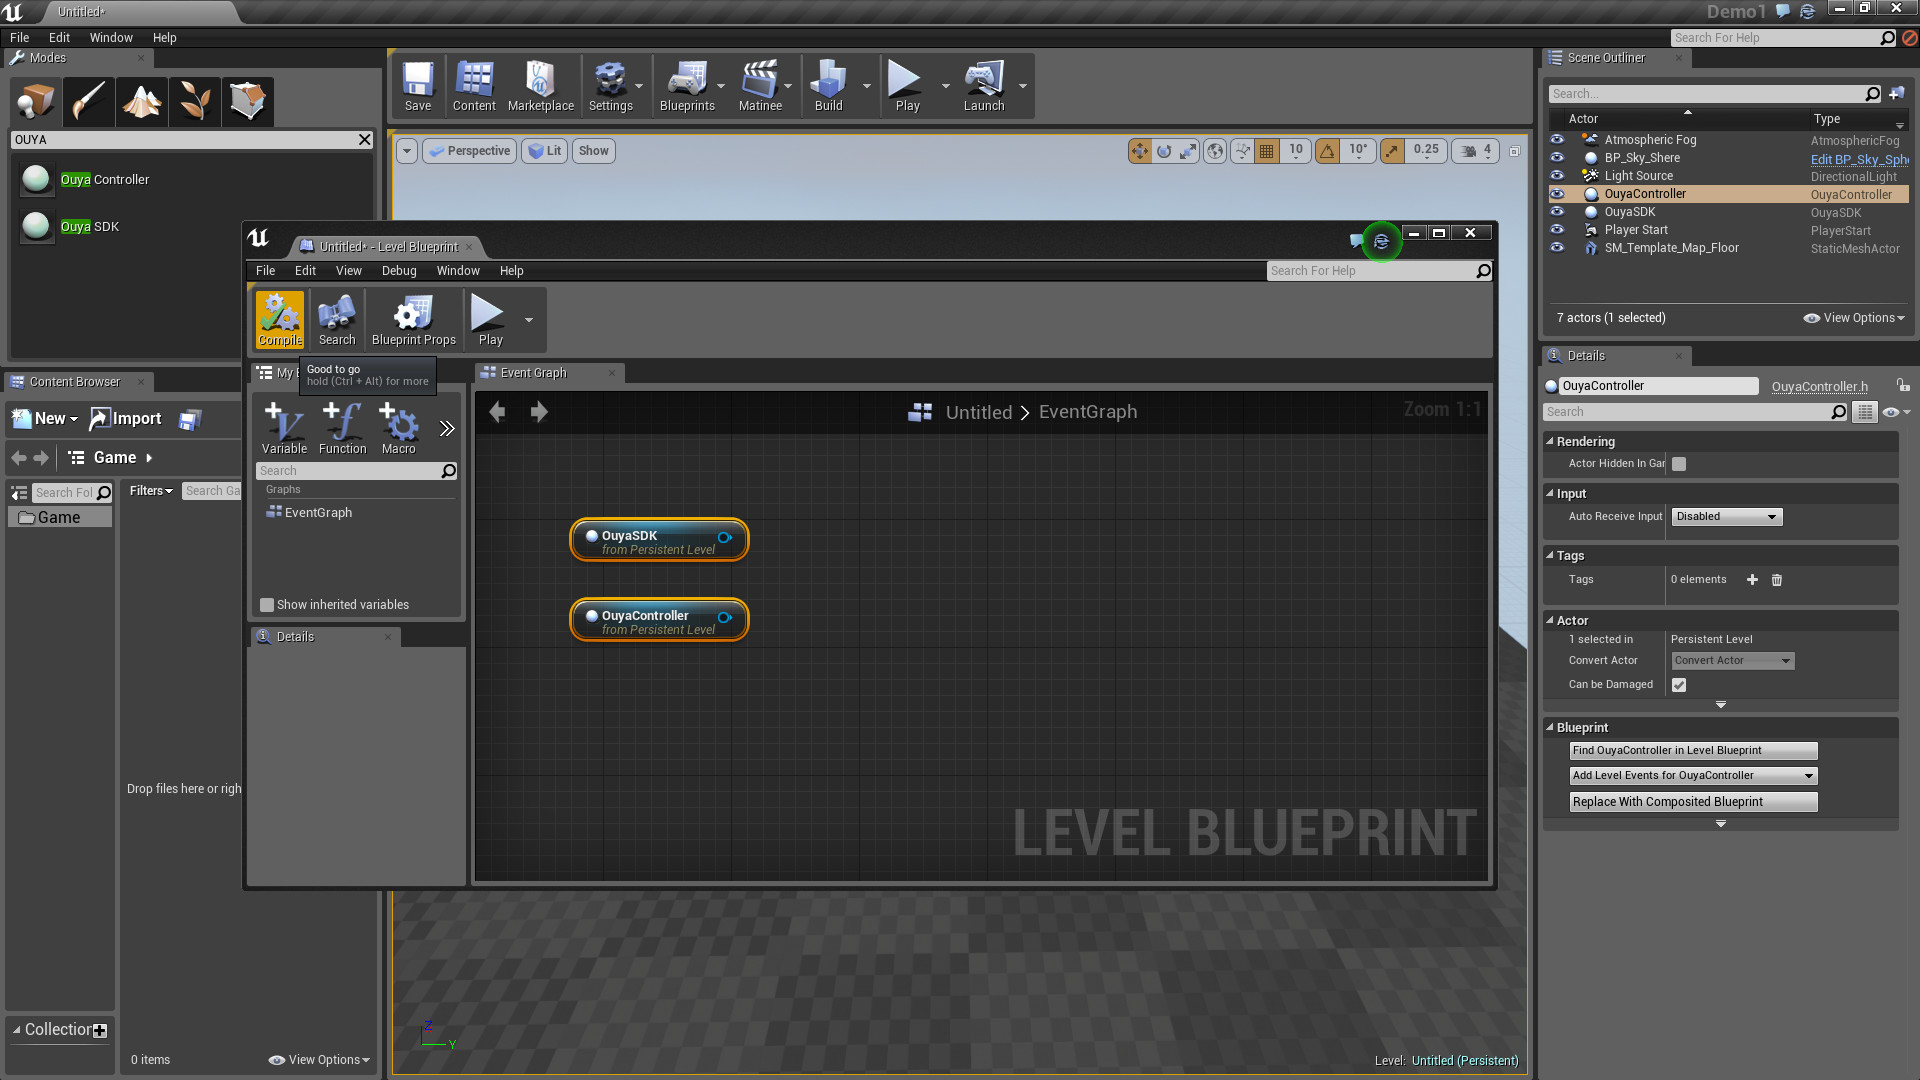 Compile Blueprint